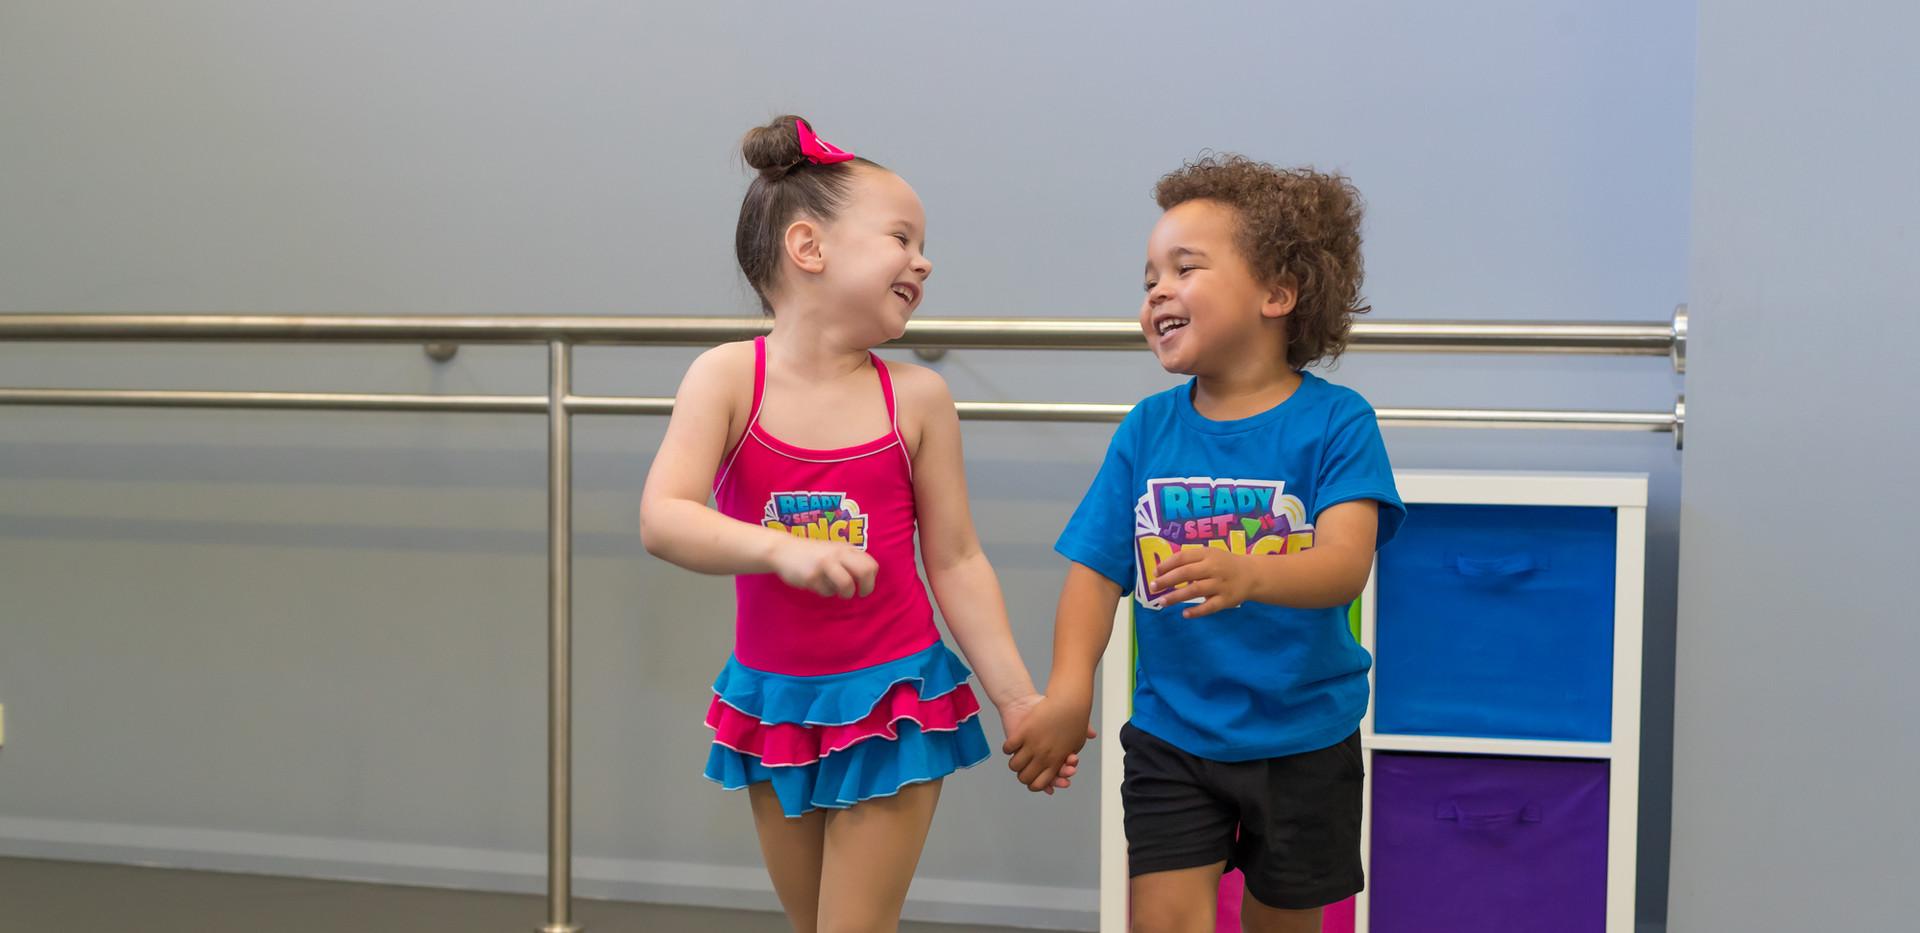 Ready Set Dance - Friendship